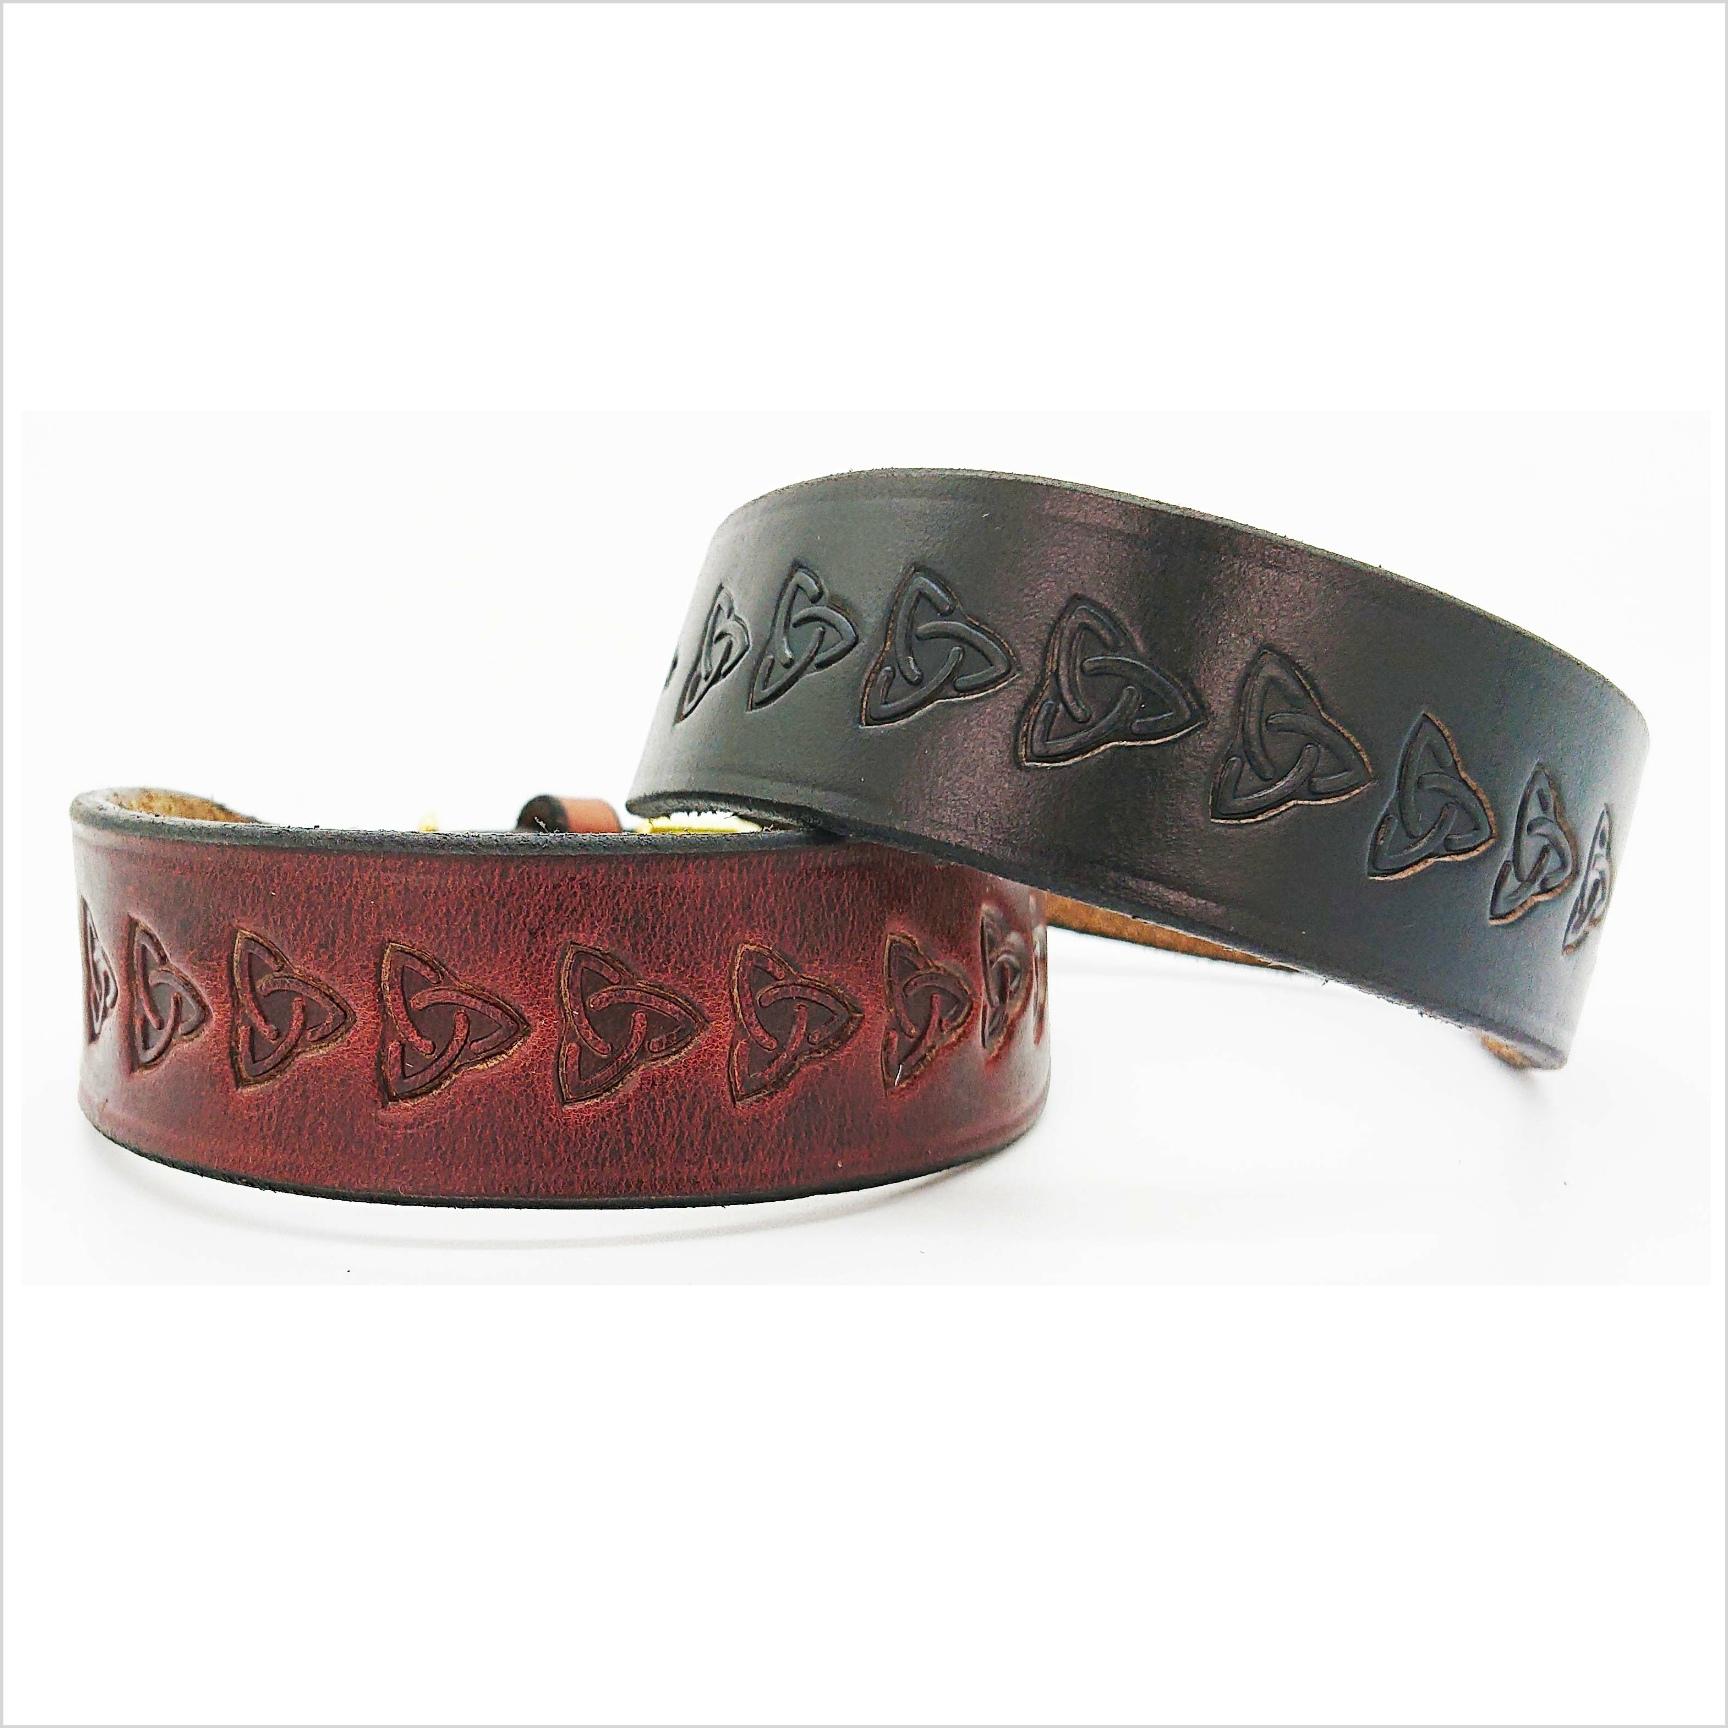 Signature Leather Terrier Collars